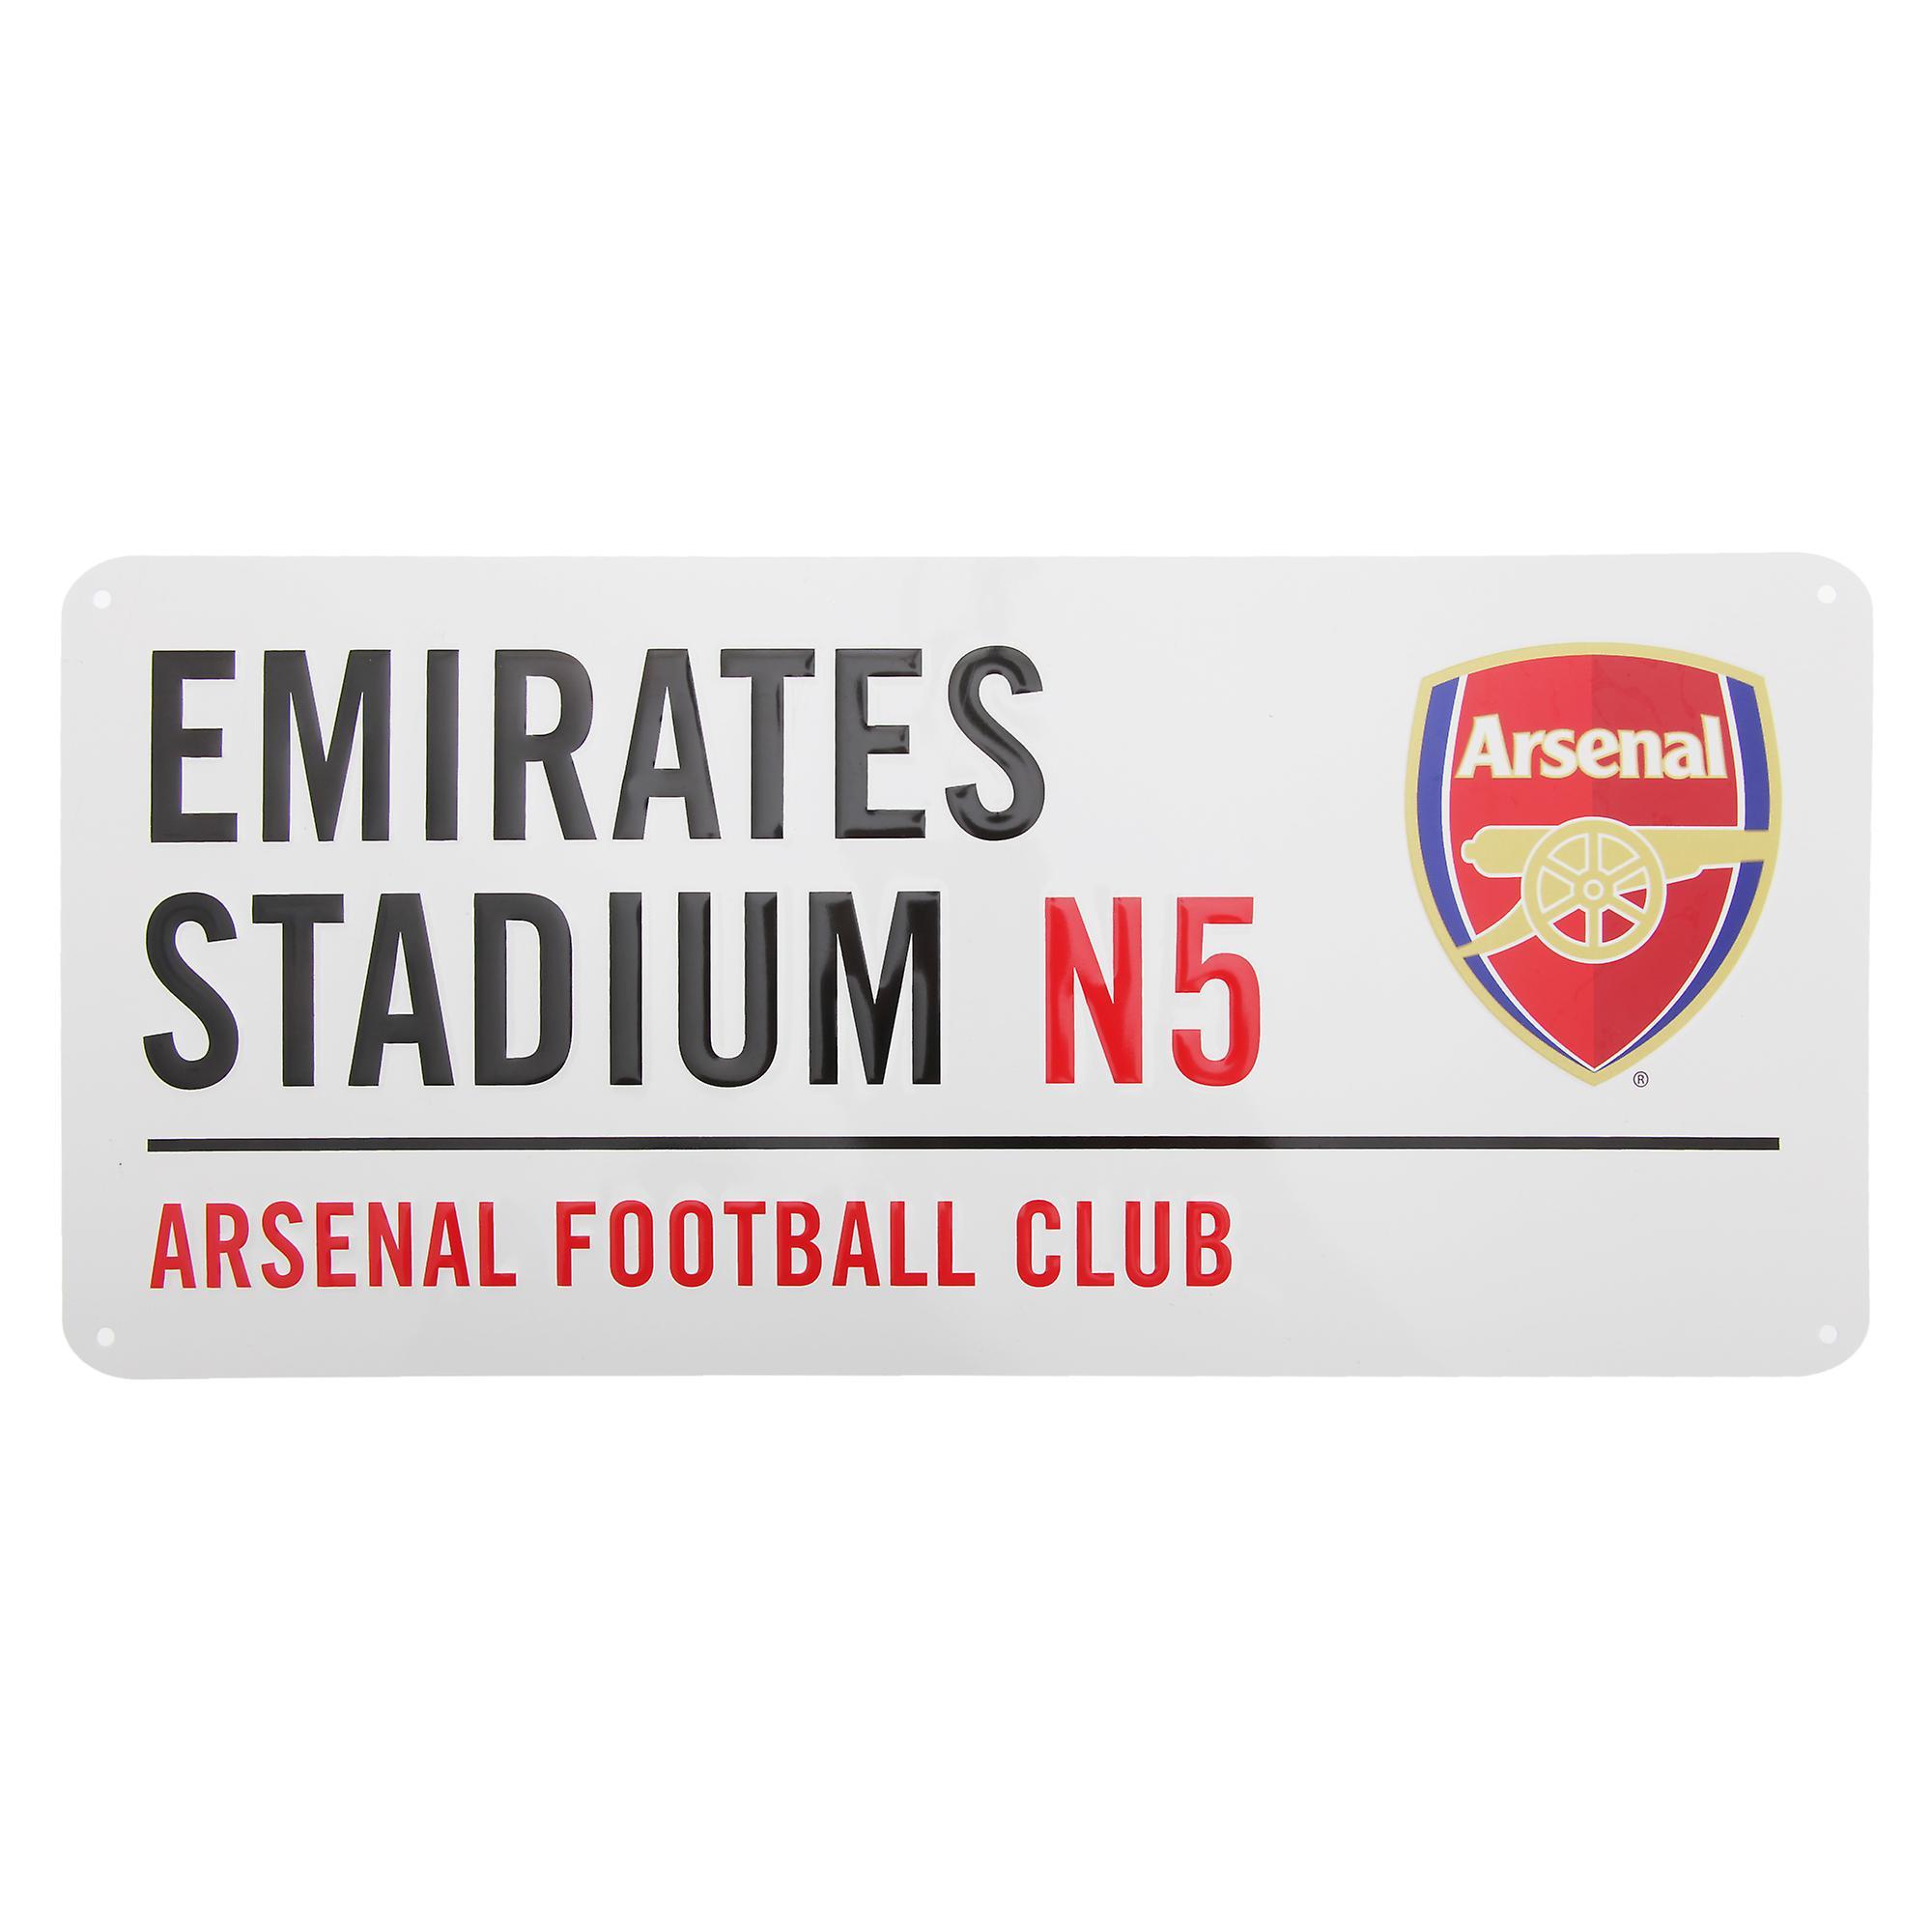 Arsenal FC officiële Emirates Stadion metalen Football Club straat teken